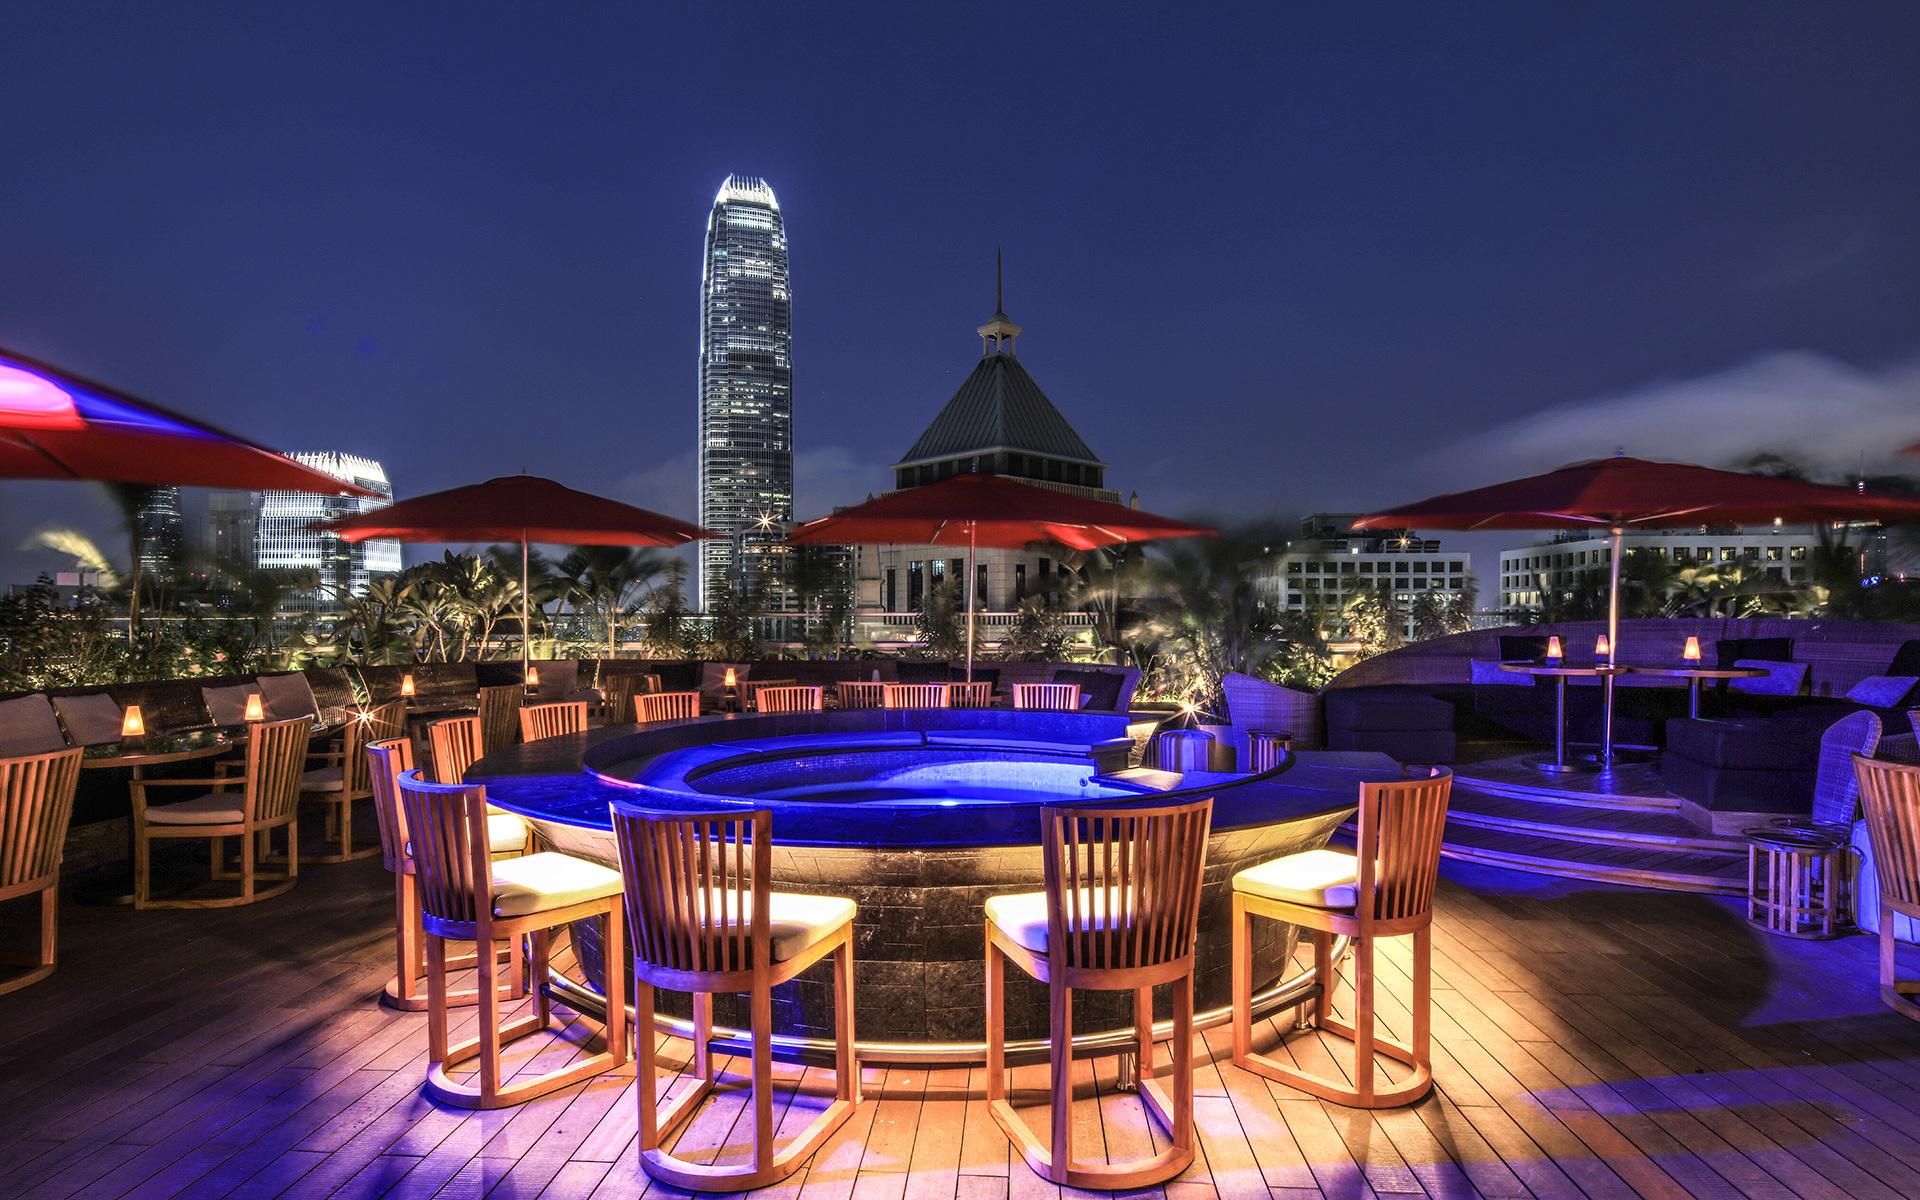 The best Hong Kong rooftop bars - Ce La Vi